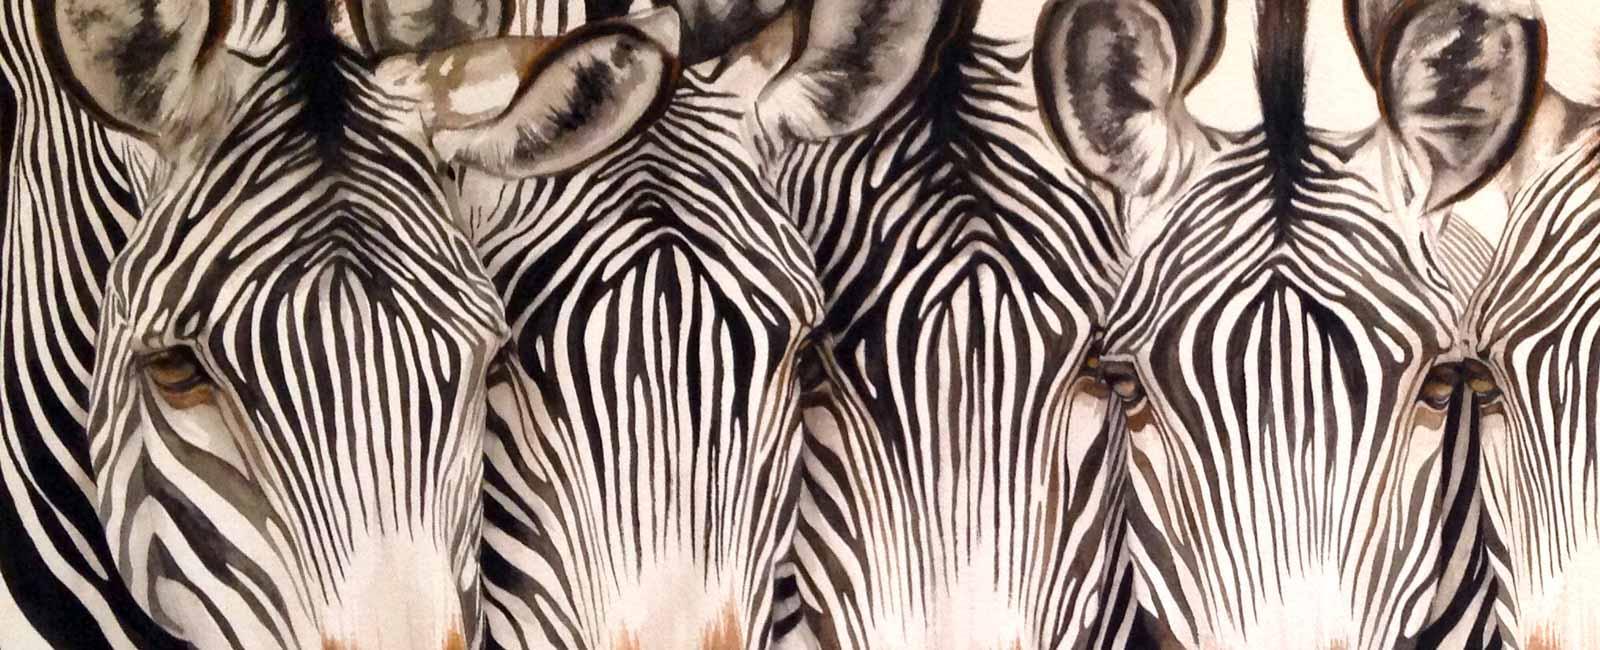 Family Resemblance, Zebras